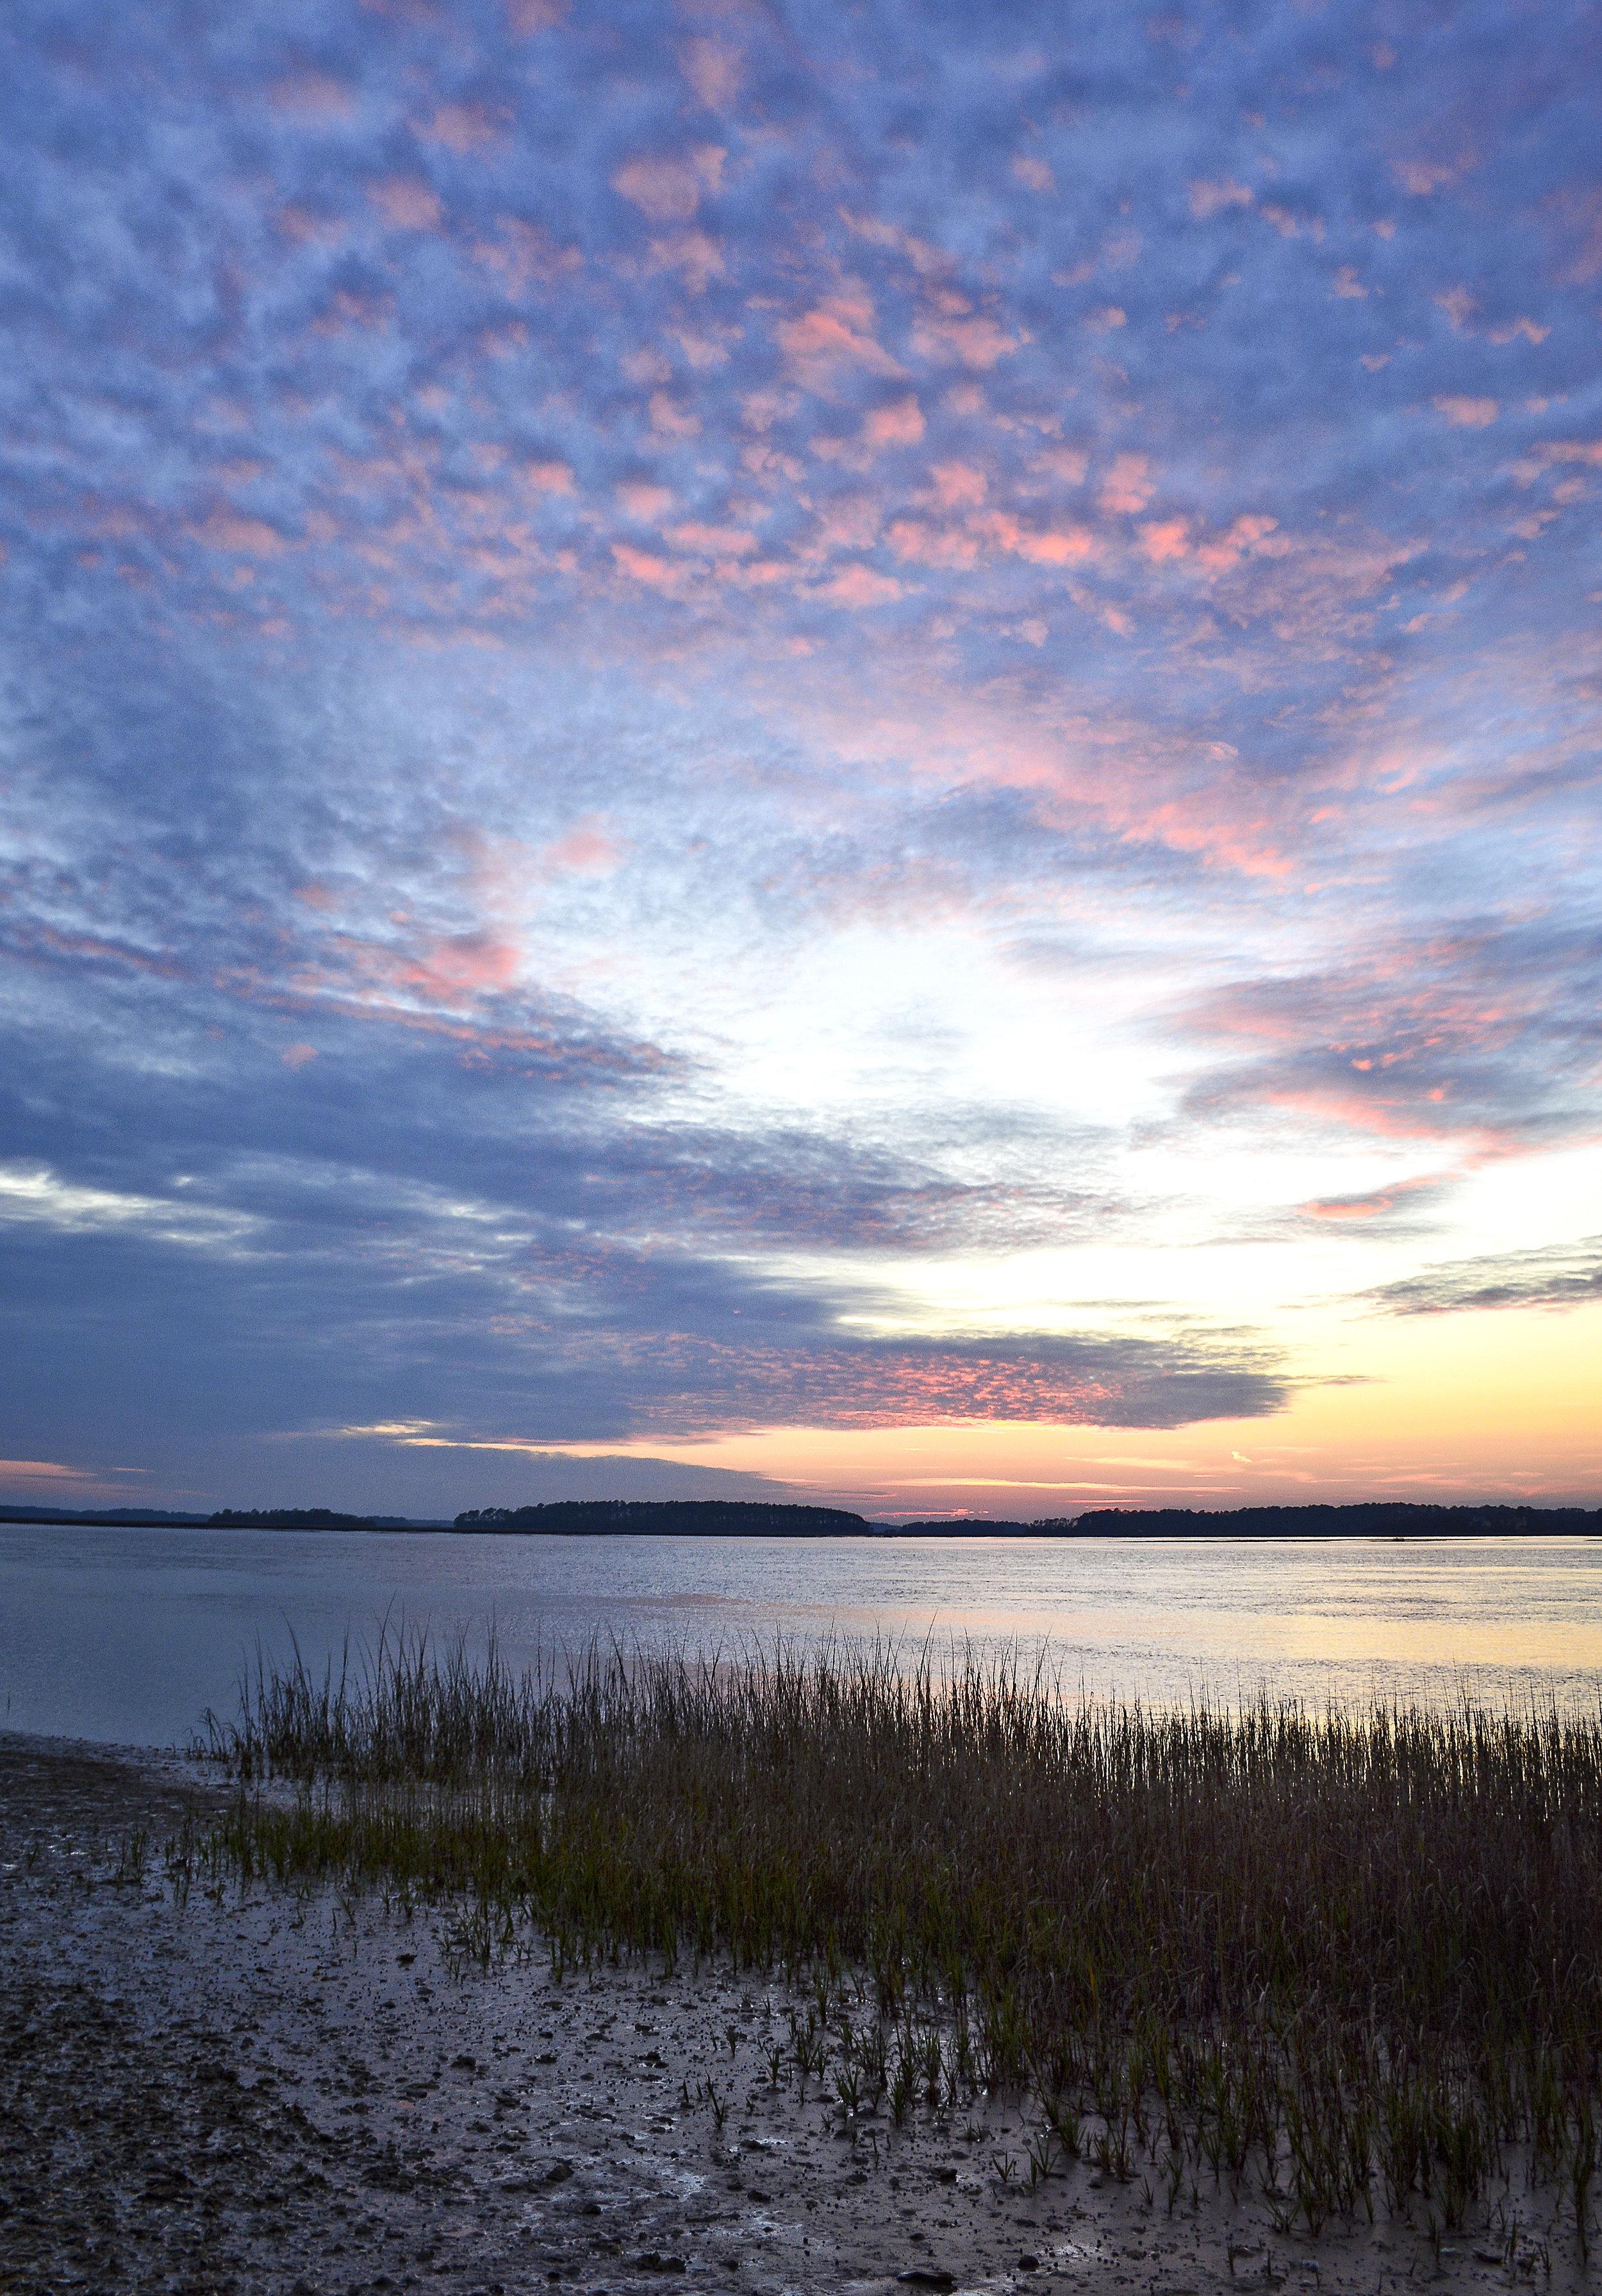 Pinckney Nature Preserve Hilton Head Island February, 2017